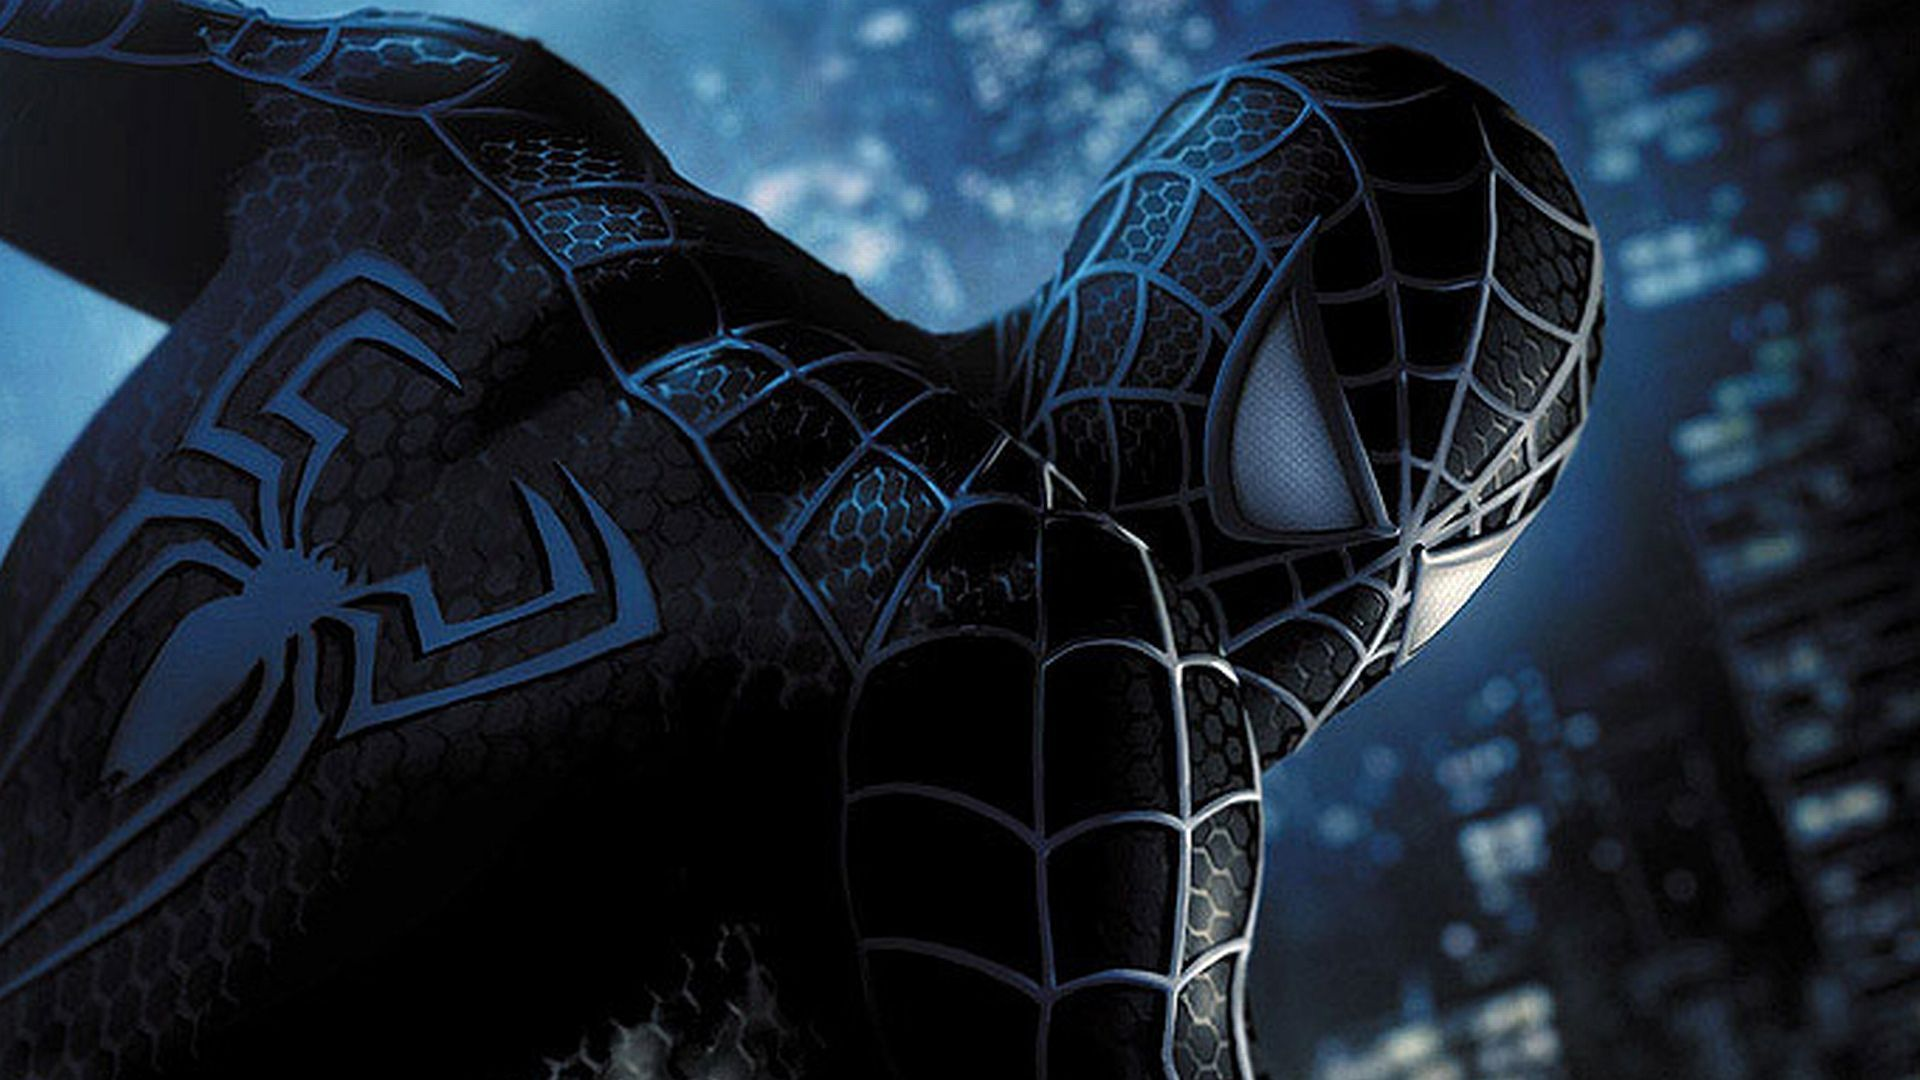 Hd wallpaper spiderman - Black Spiderman Wallpapers Hd Resolution With Hd Wallpaper 1920x1080 Px 194 15 Kb Choses A Acheter Pinterest Spiderman Wallpaper And Hd Wallpaper